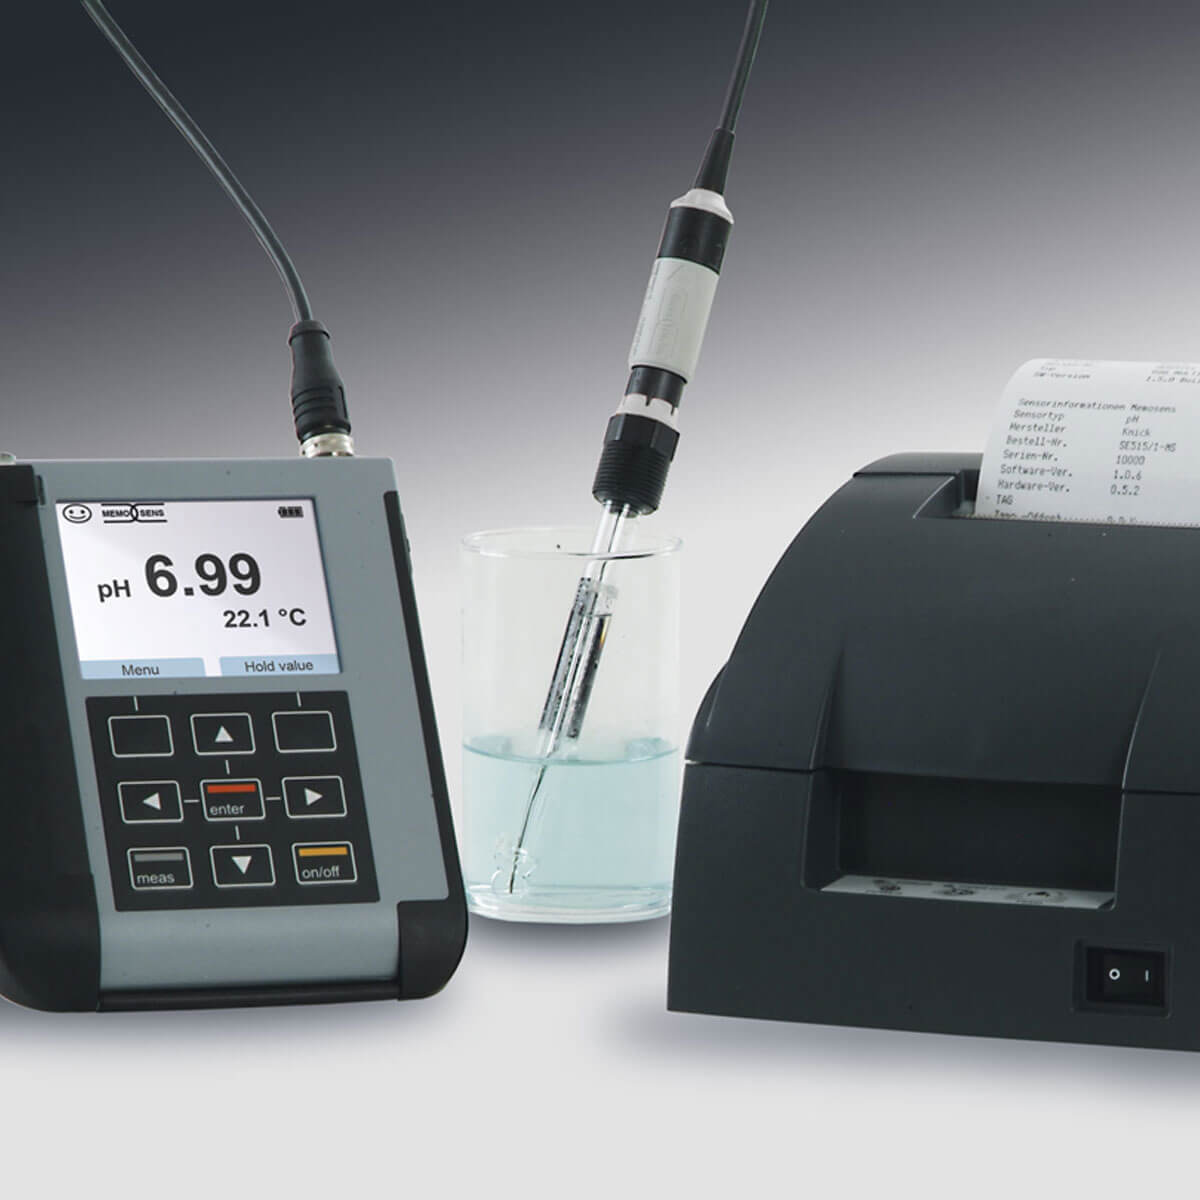 Portables for liquid analytics